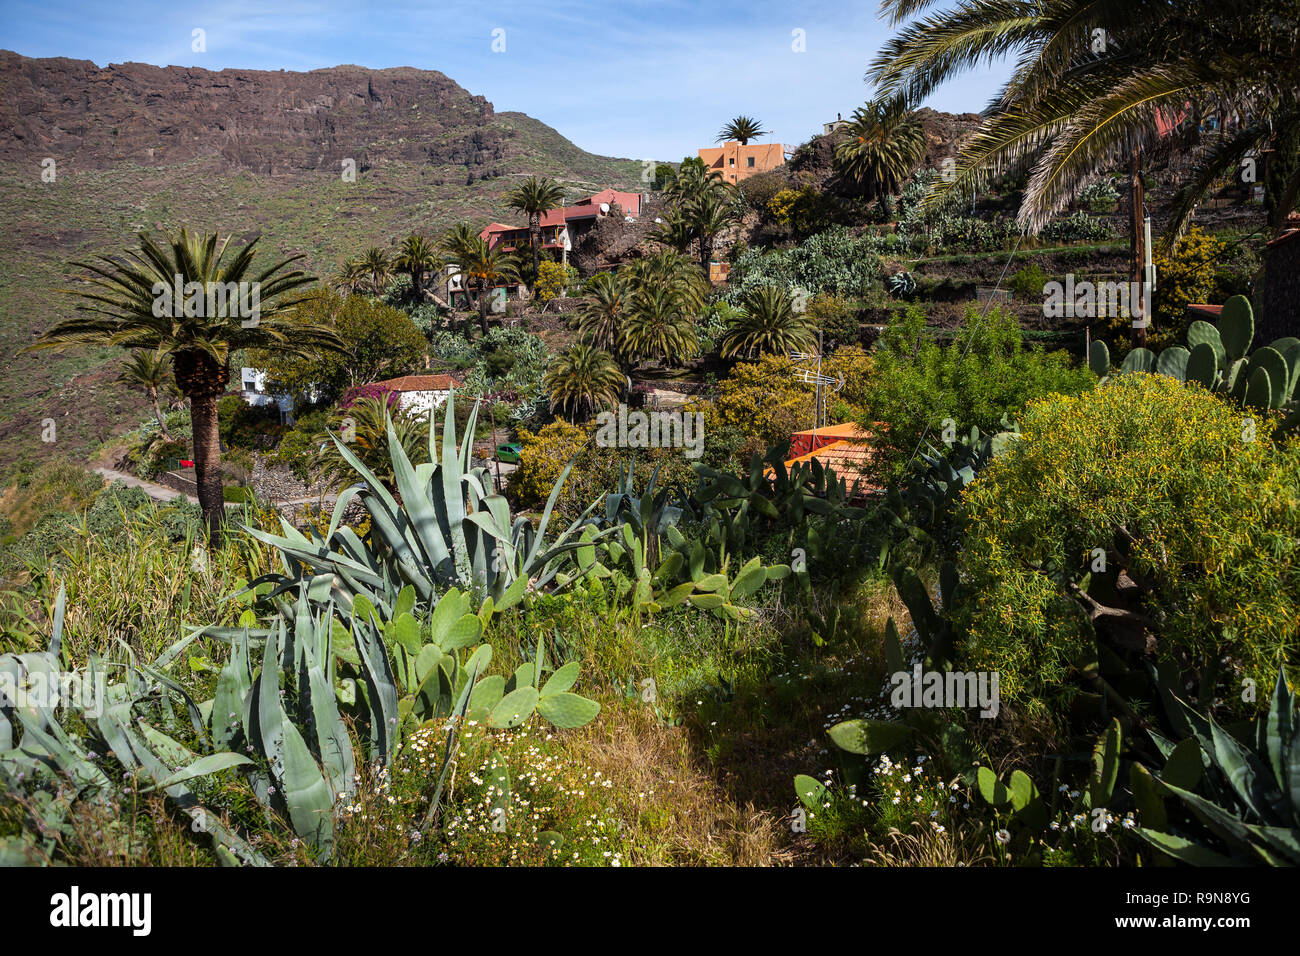 Dorf Masca auf Teneriffa, Kanarische Inseln, Spanien Stockbild